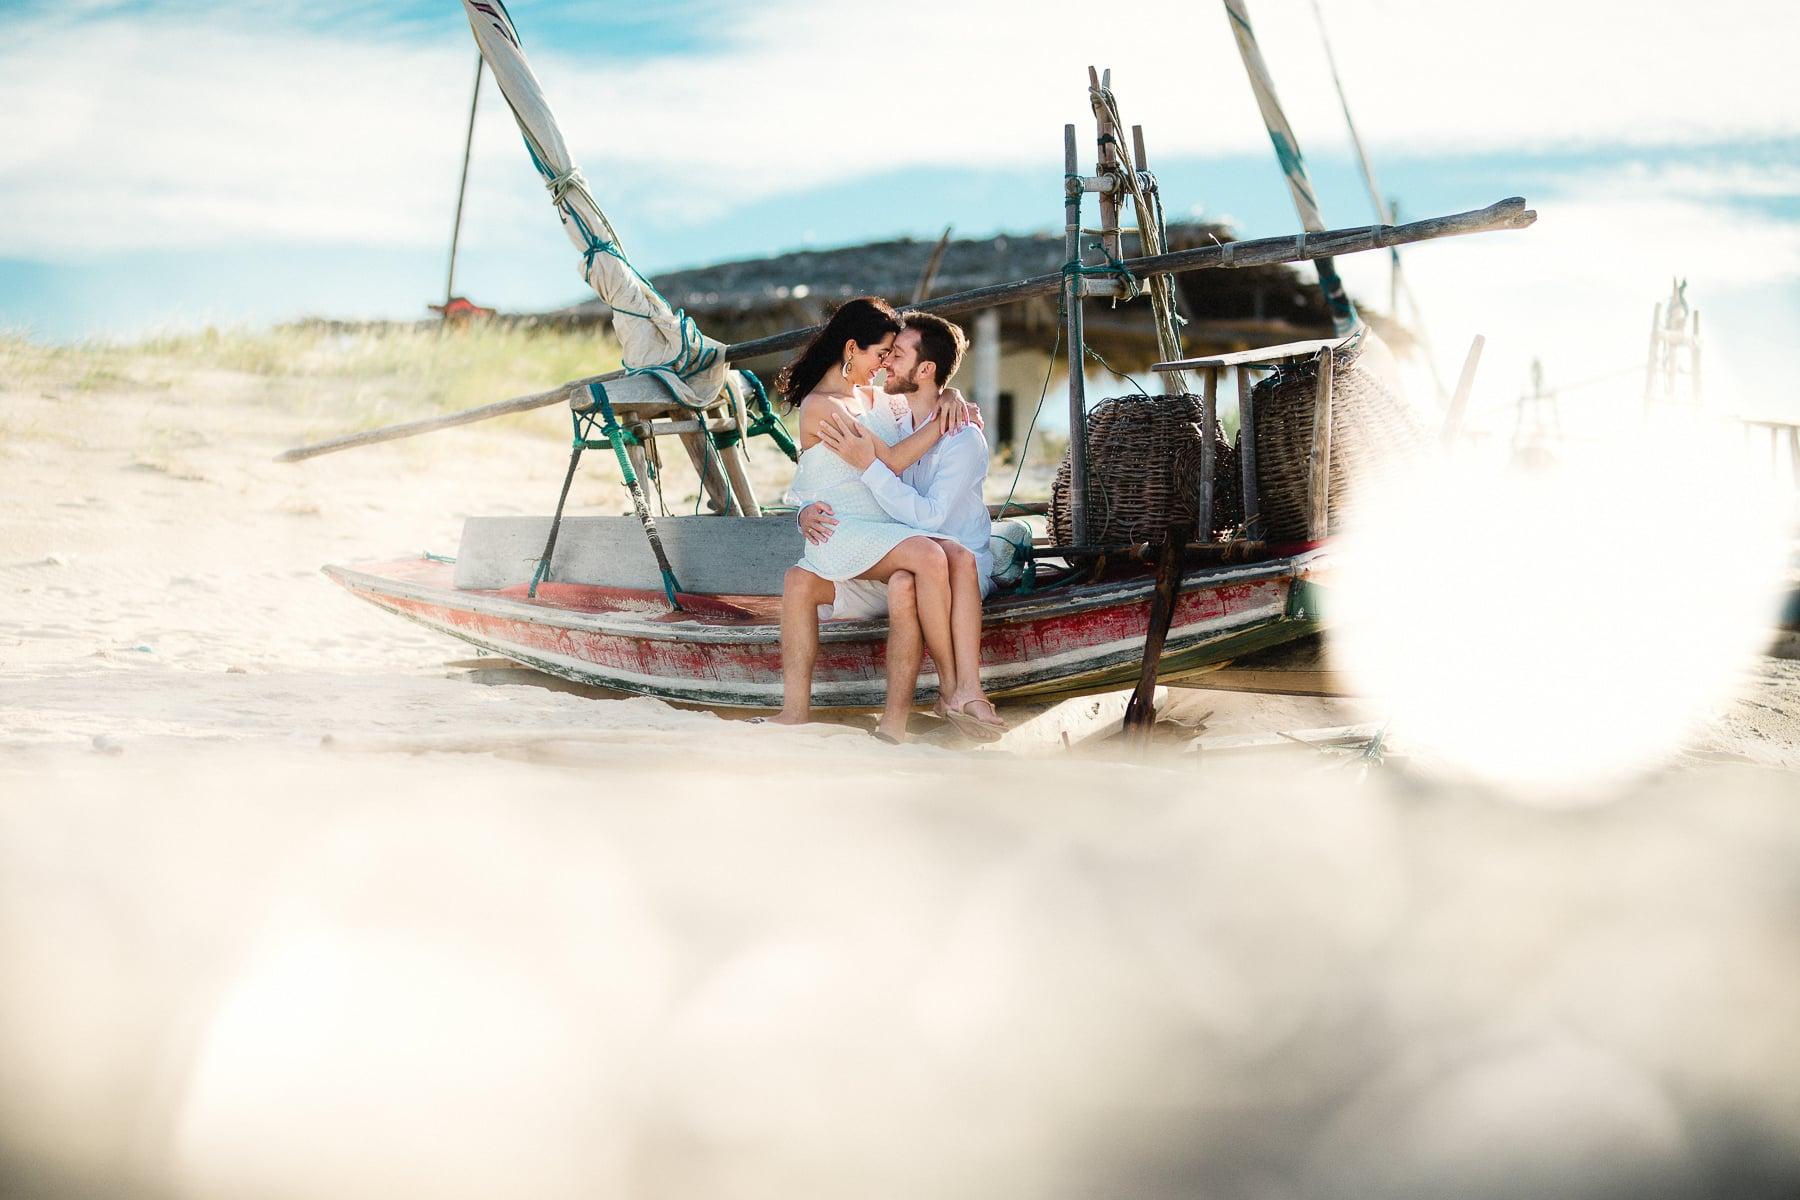 fotos de casal no barco